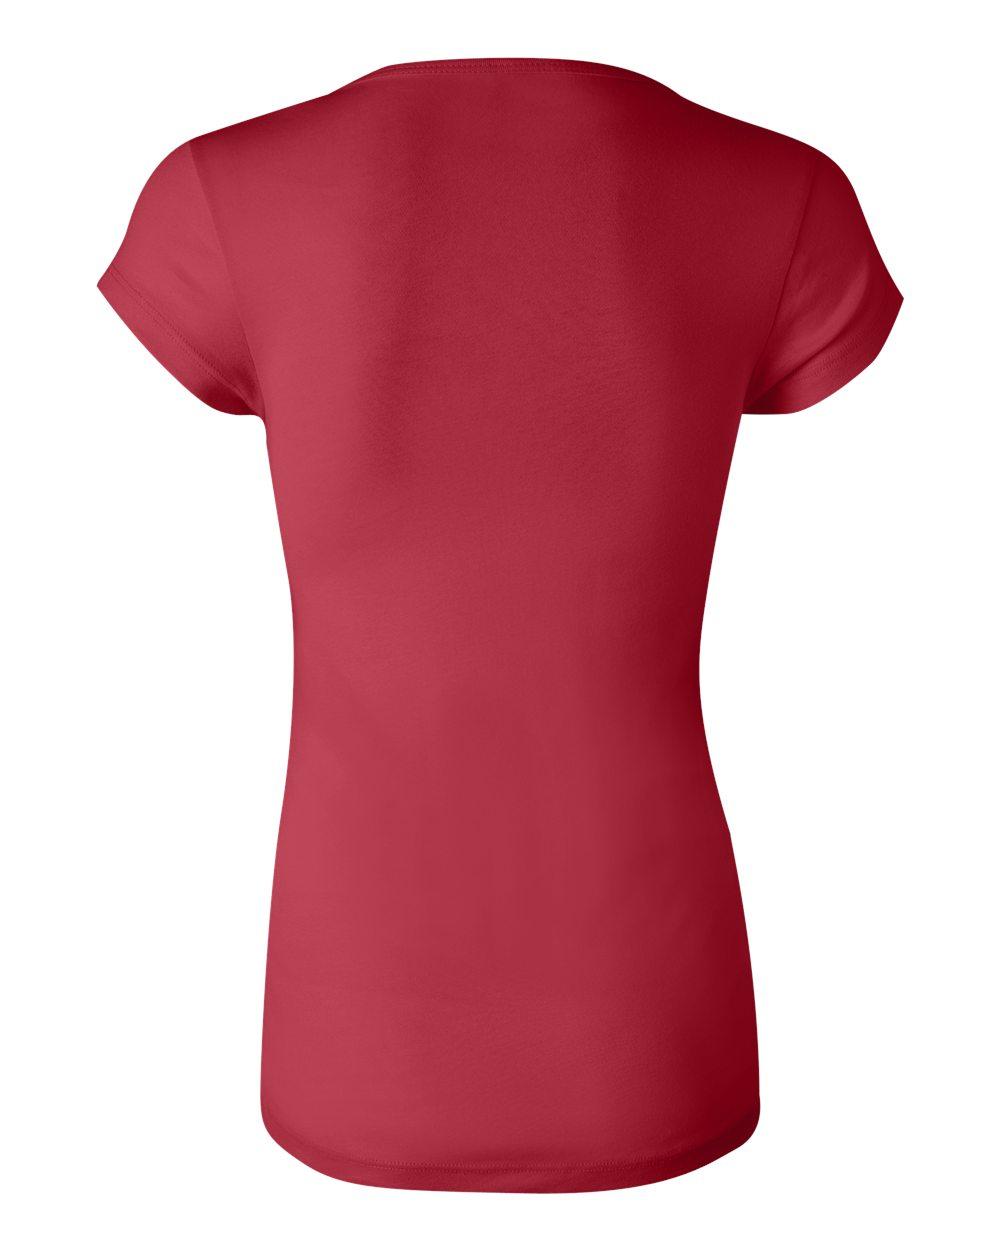 Bella-Canvas-Women-039-s-Sheer-Mini-Rib-Short-Sleeve-Scoop-Neck-T-Shirt-B8703-S-2XL thumbnail 9